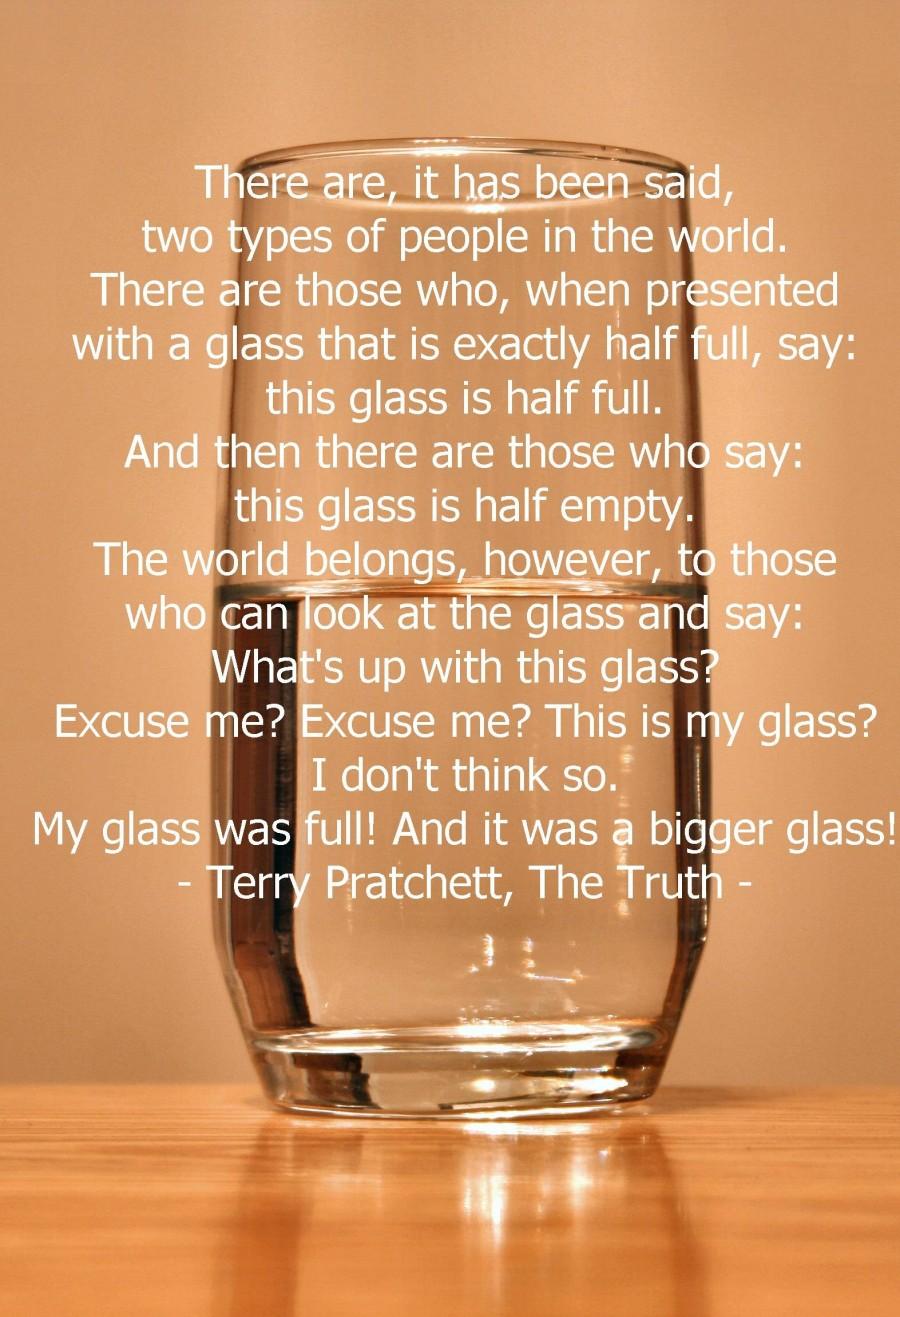 Terry Prachett's quote #8